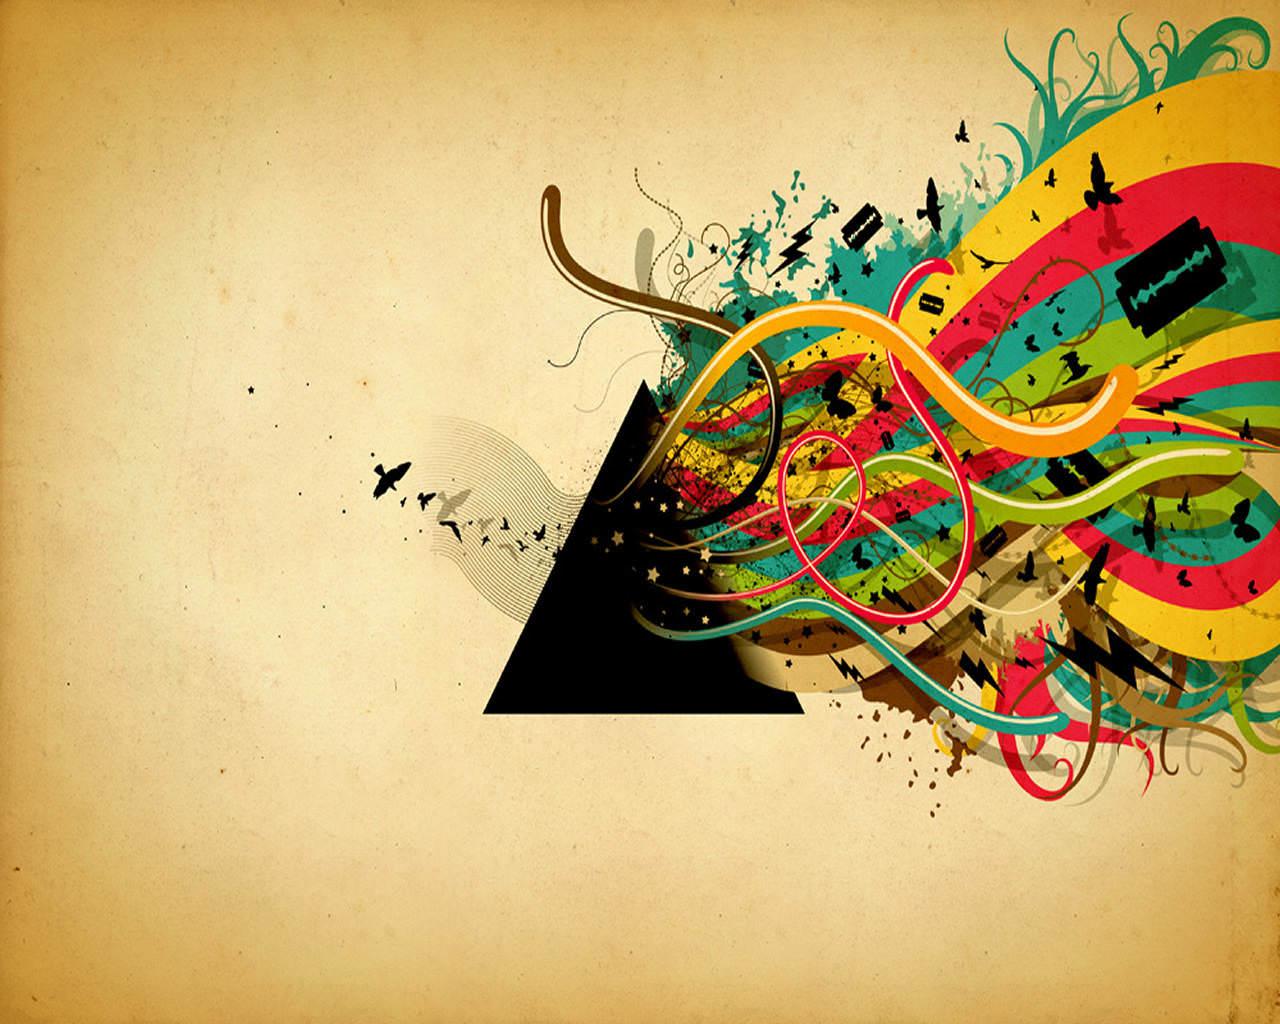 Music Pink Floyd Band Wallpaper